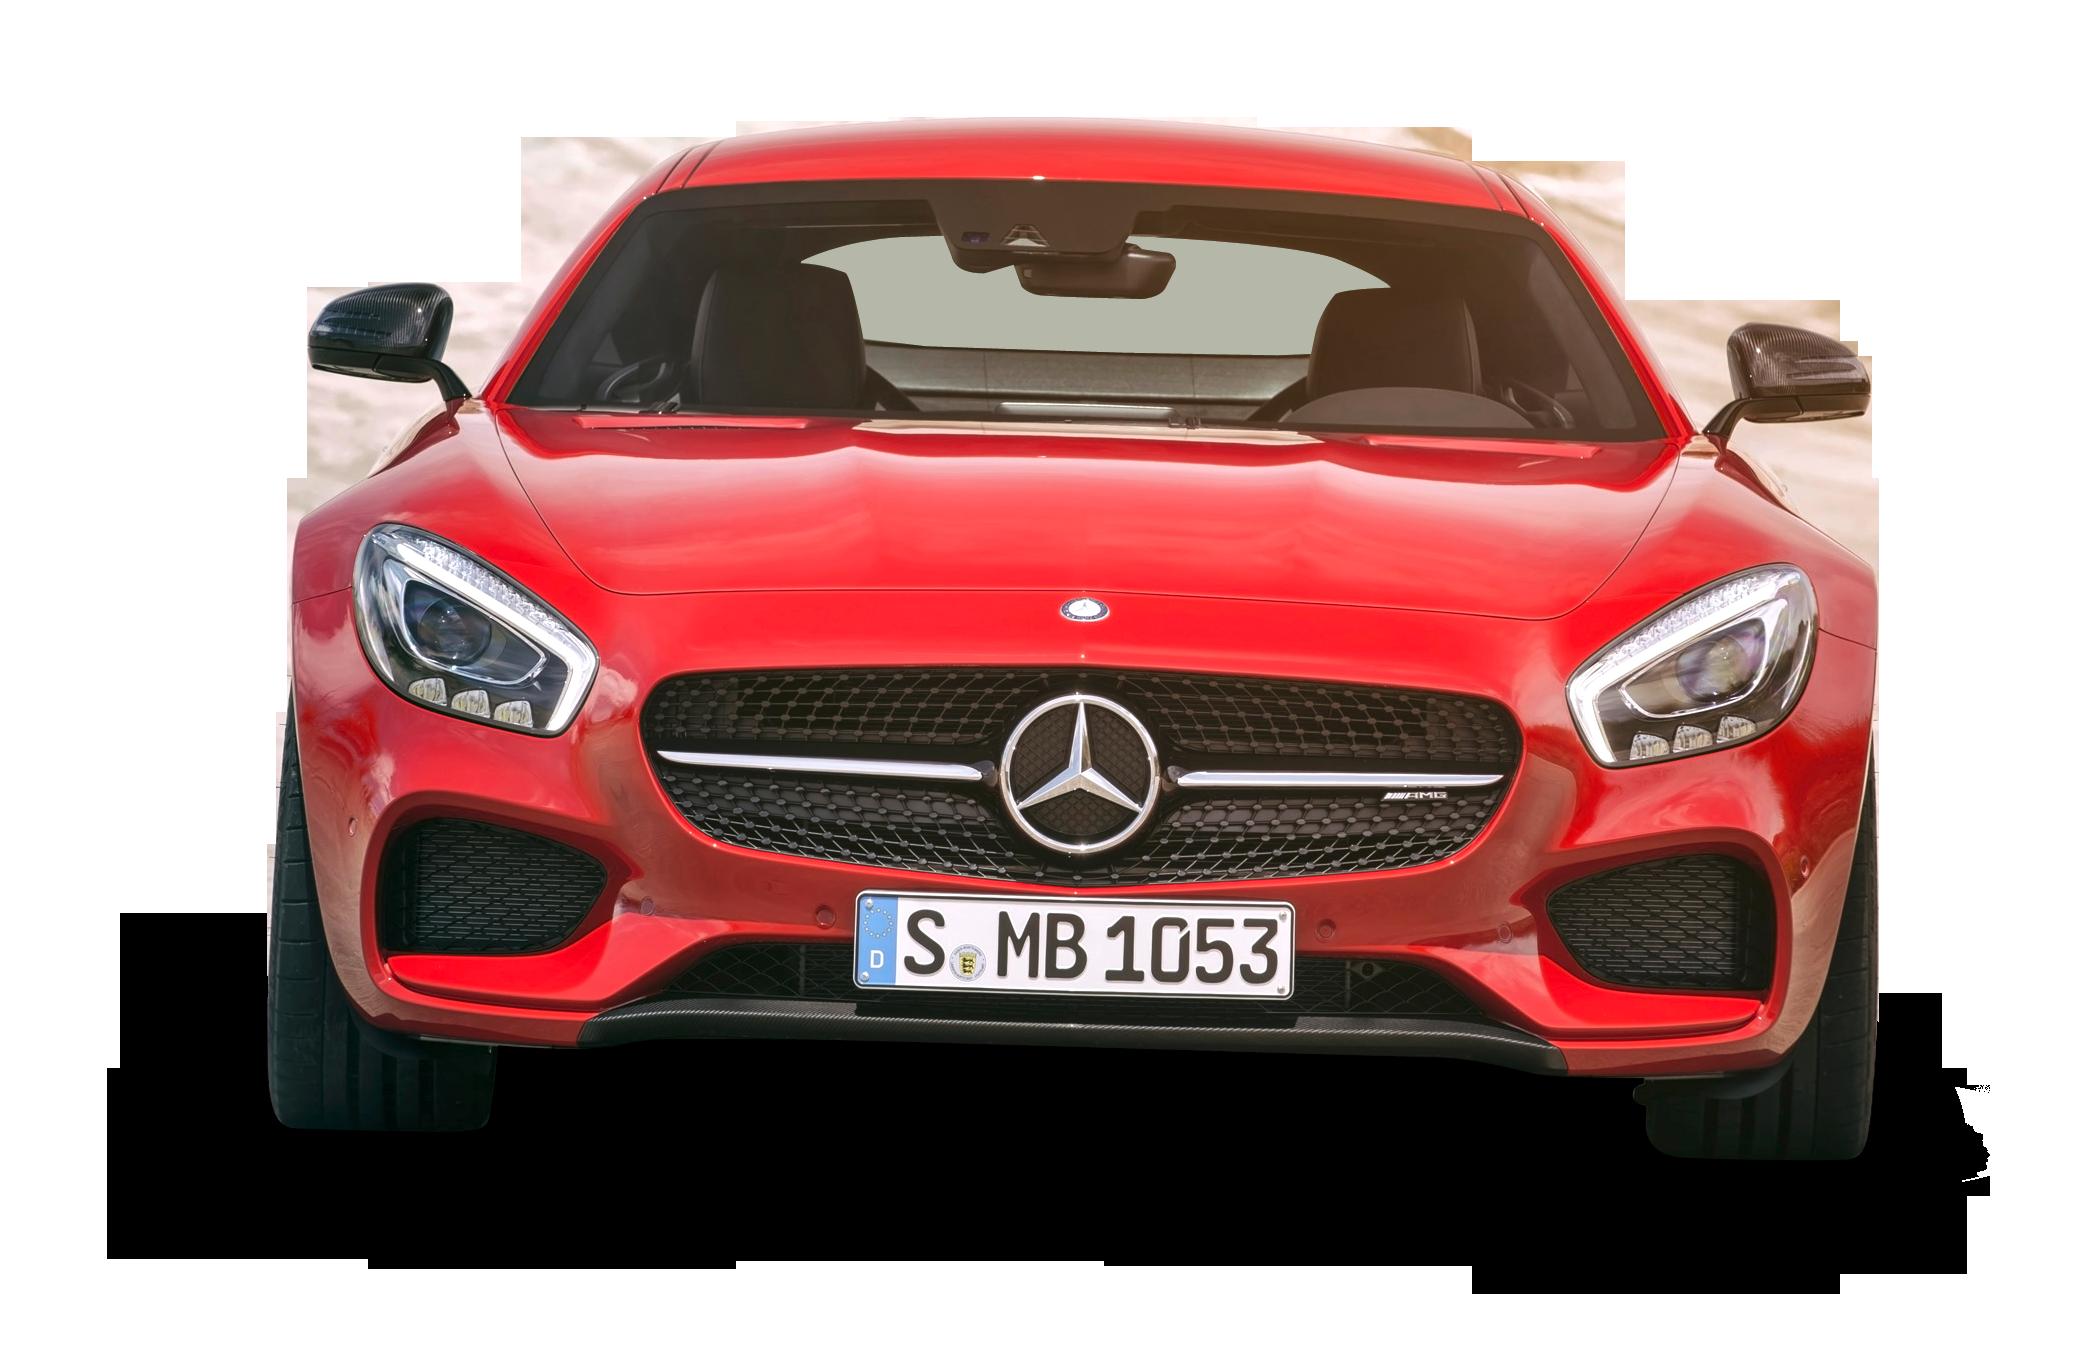 Mercedes Car Front Png Image #32712 - Car, Transparent background PNG HD thumbnail